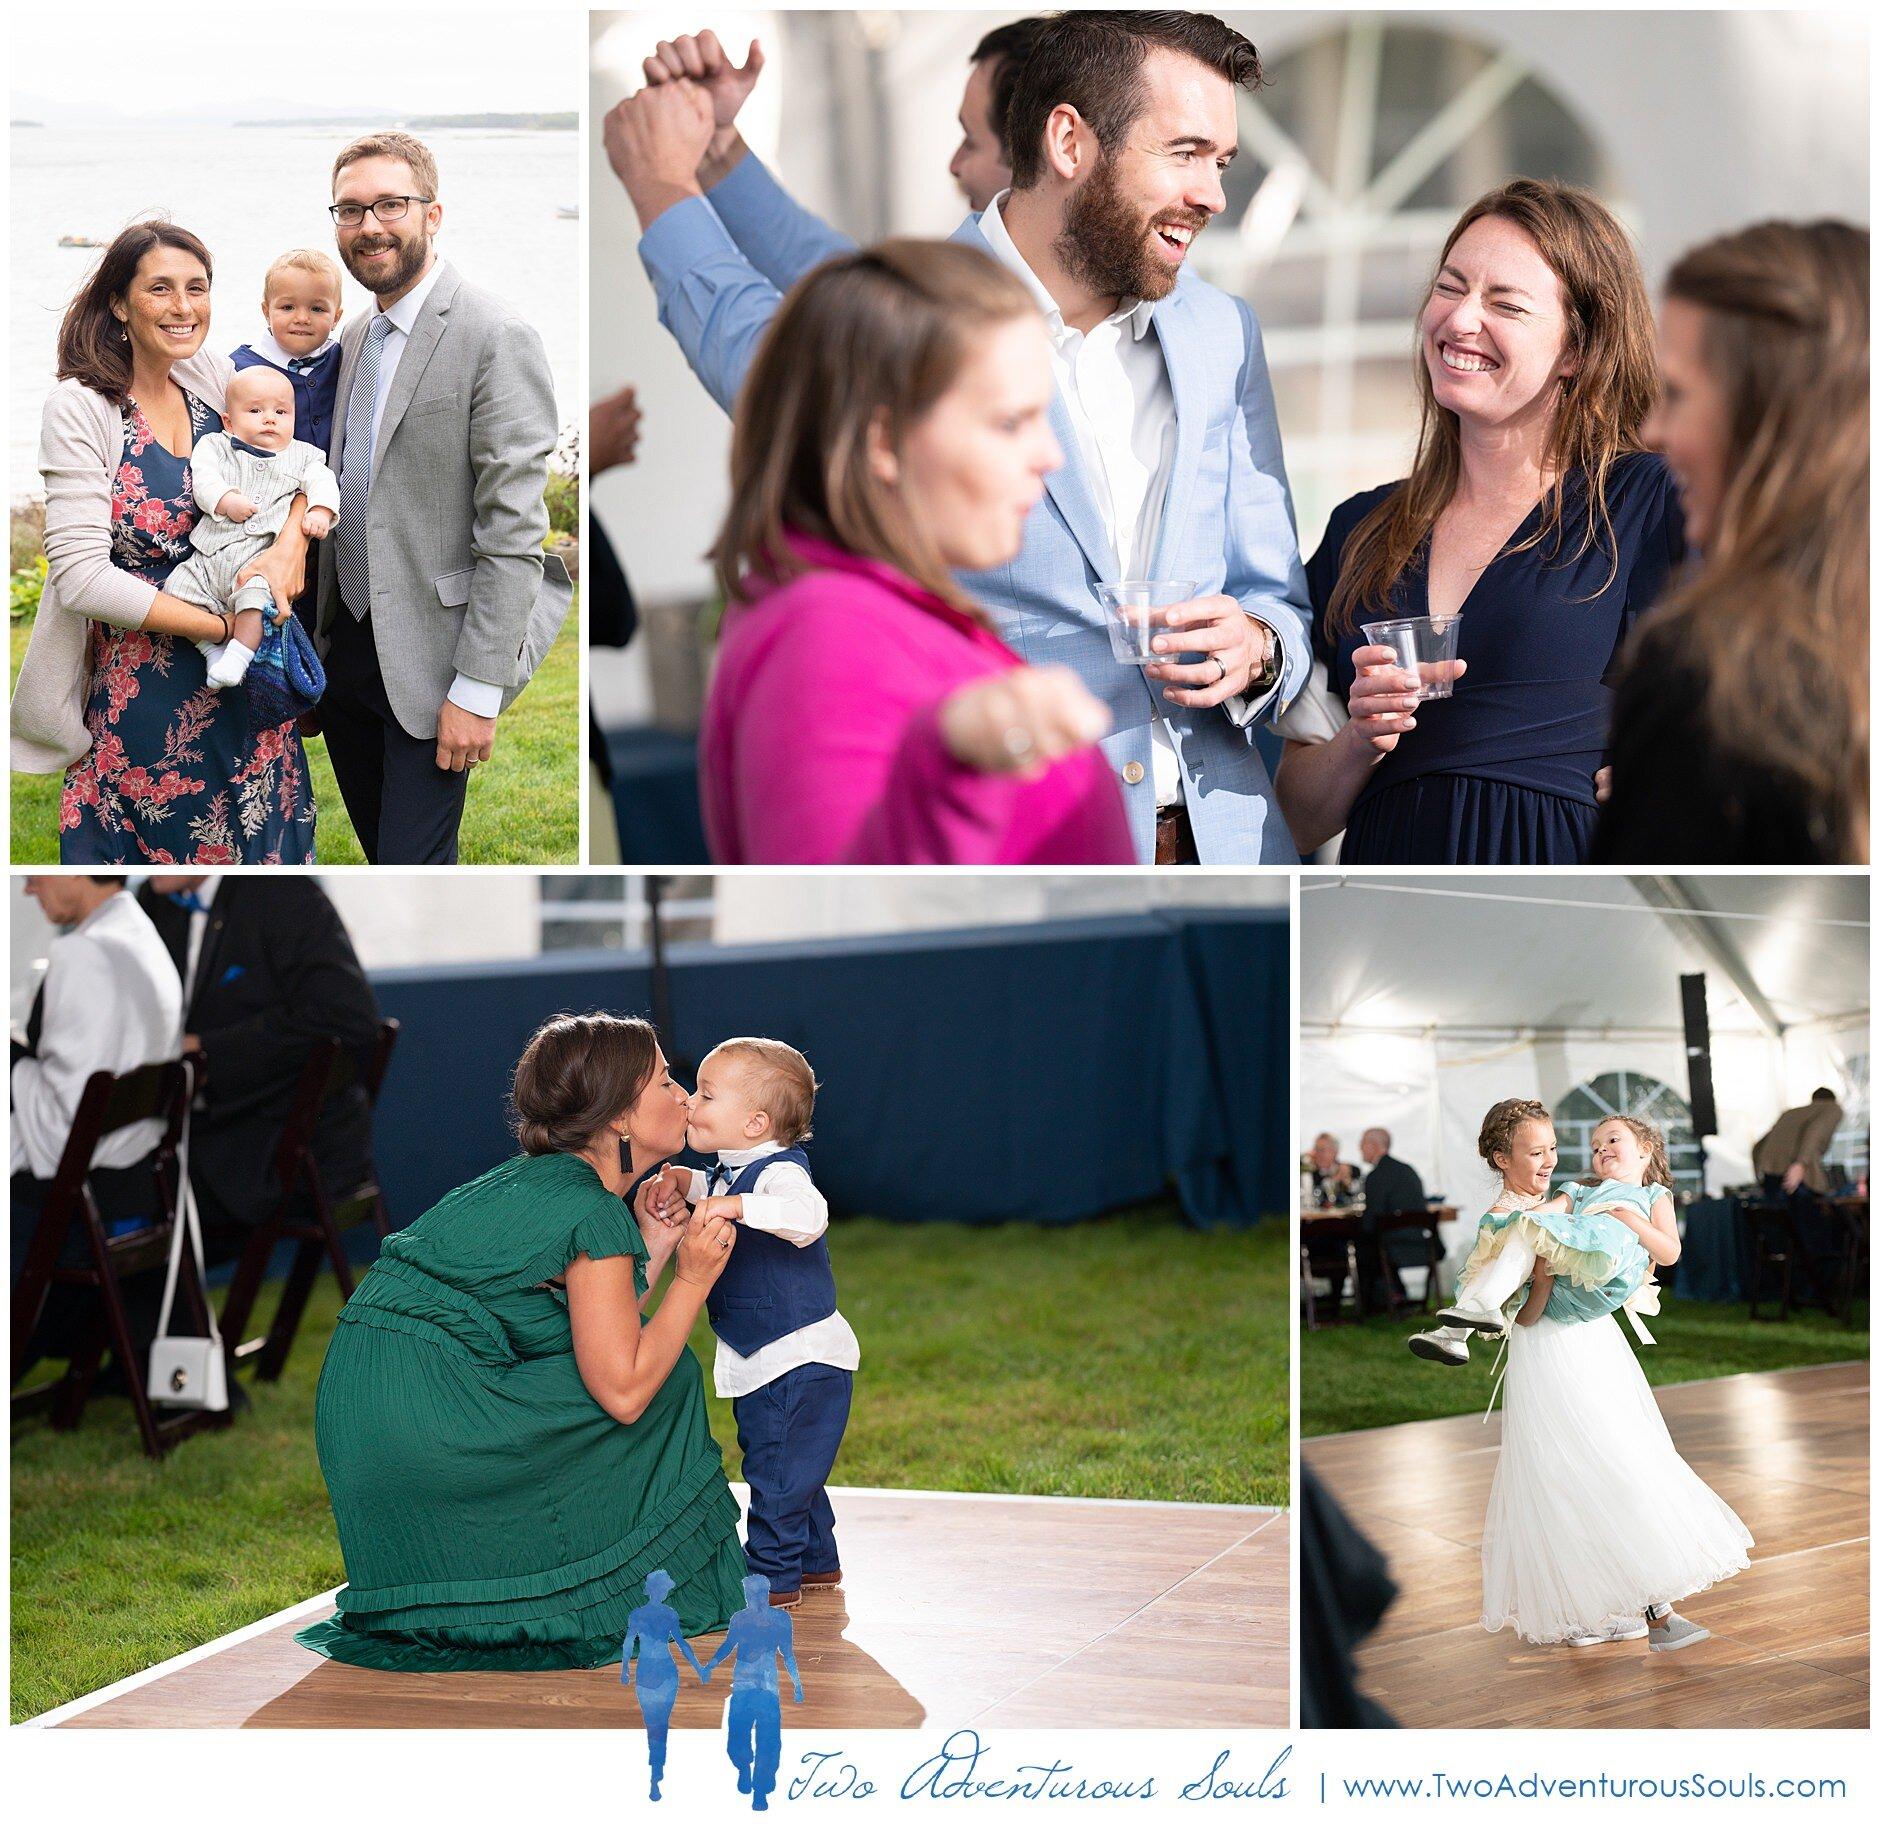 Bar Harbor Wedding Photographers, Acadia Bay Inn Wedding Photographers, Two Adventurous Souls- 091419_0034.jpg